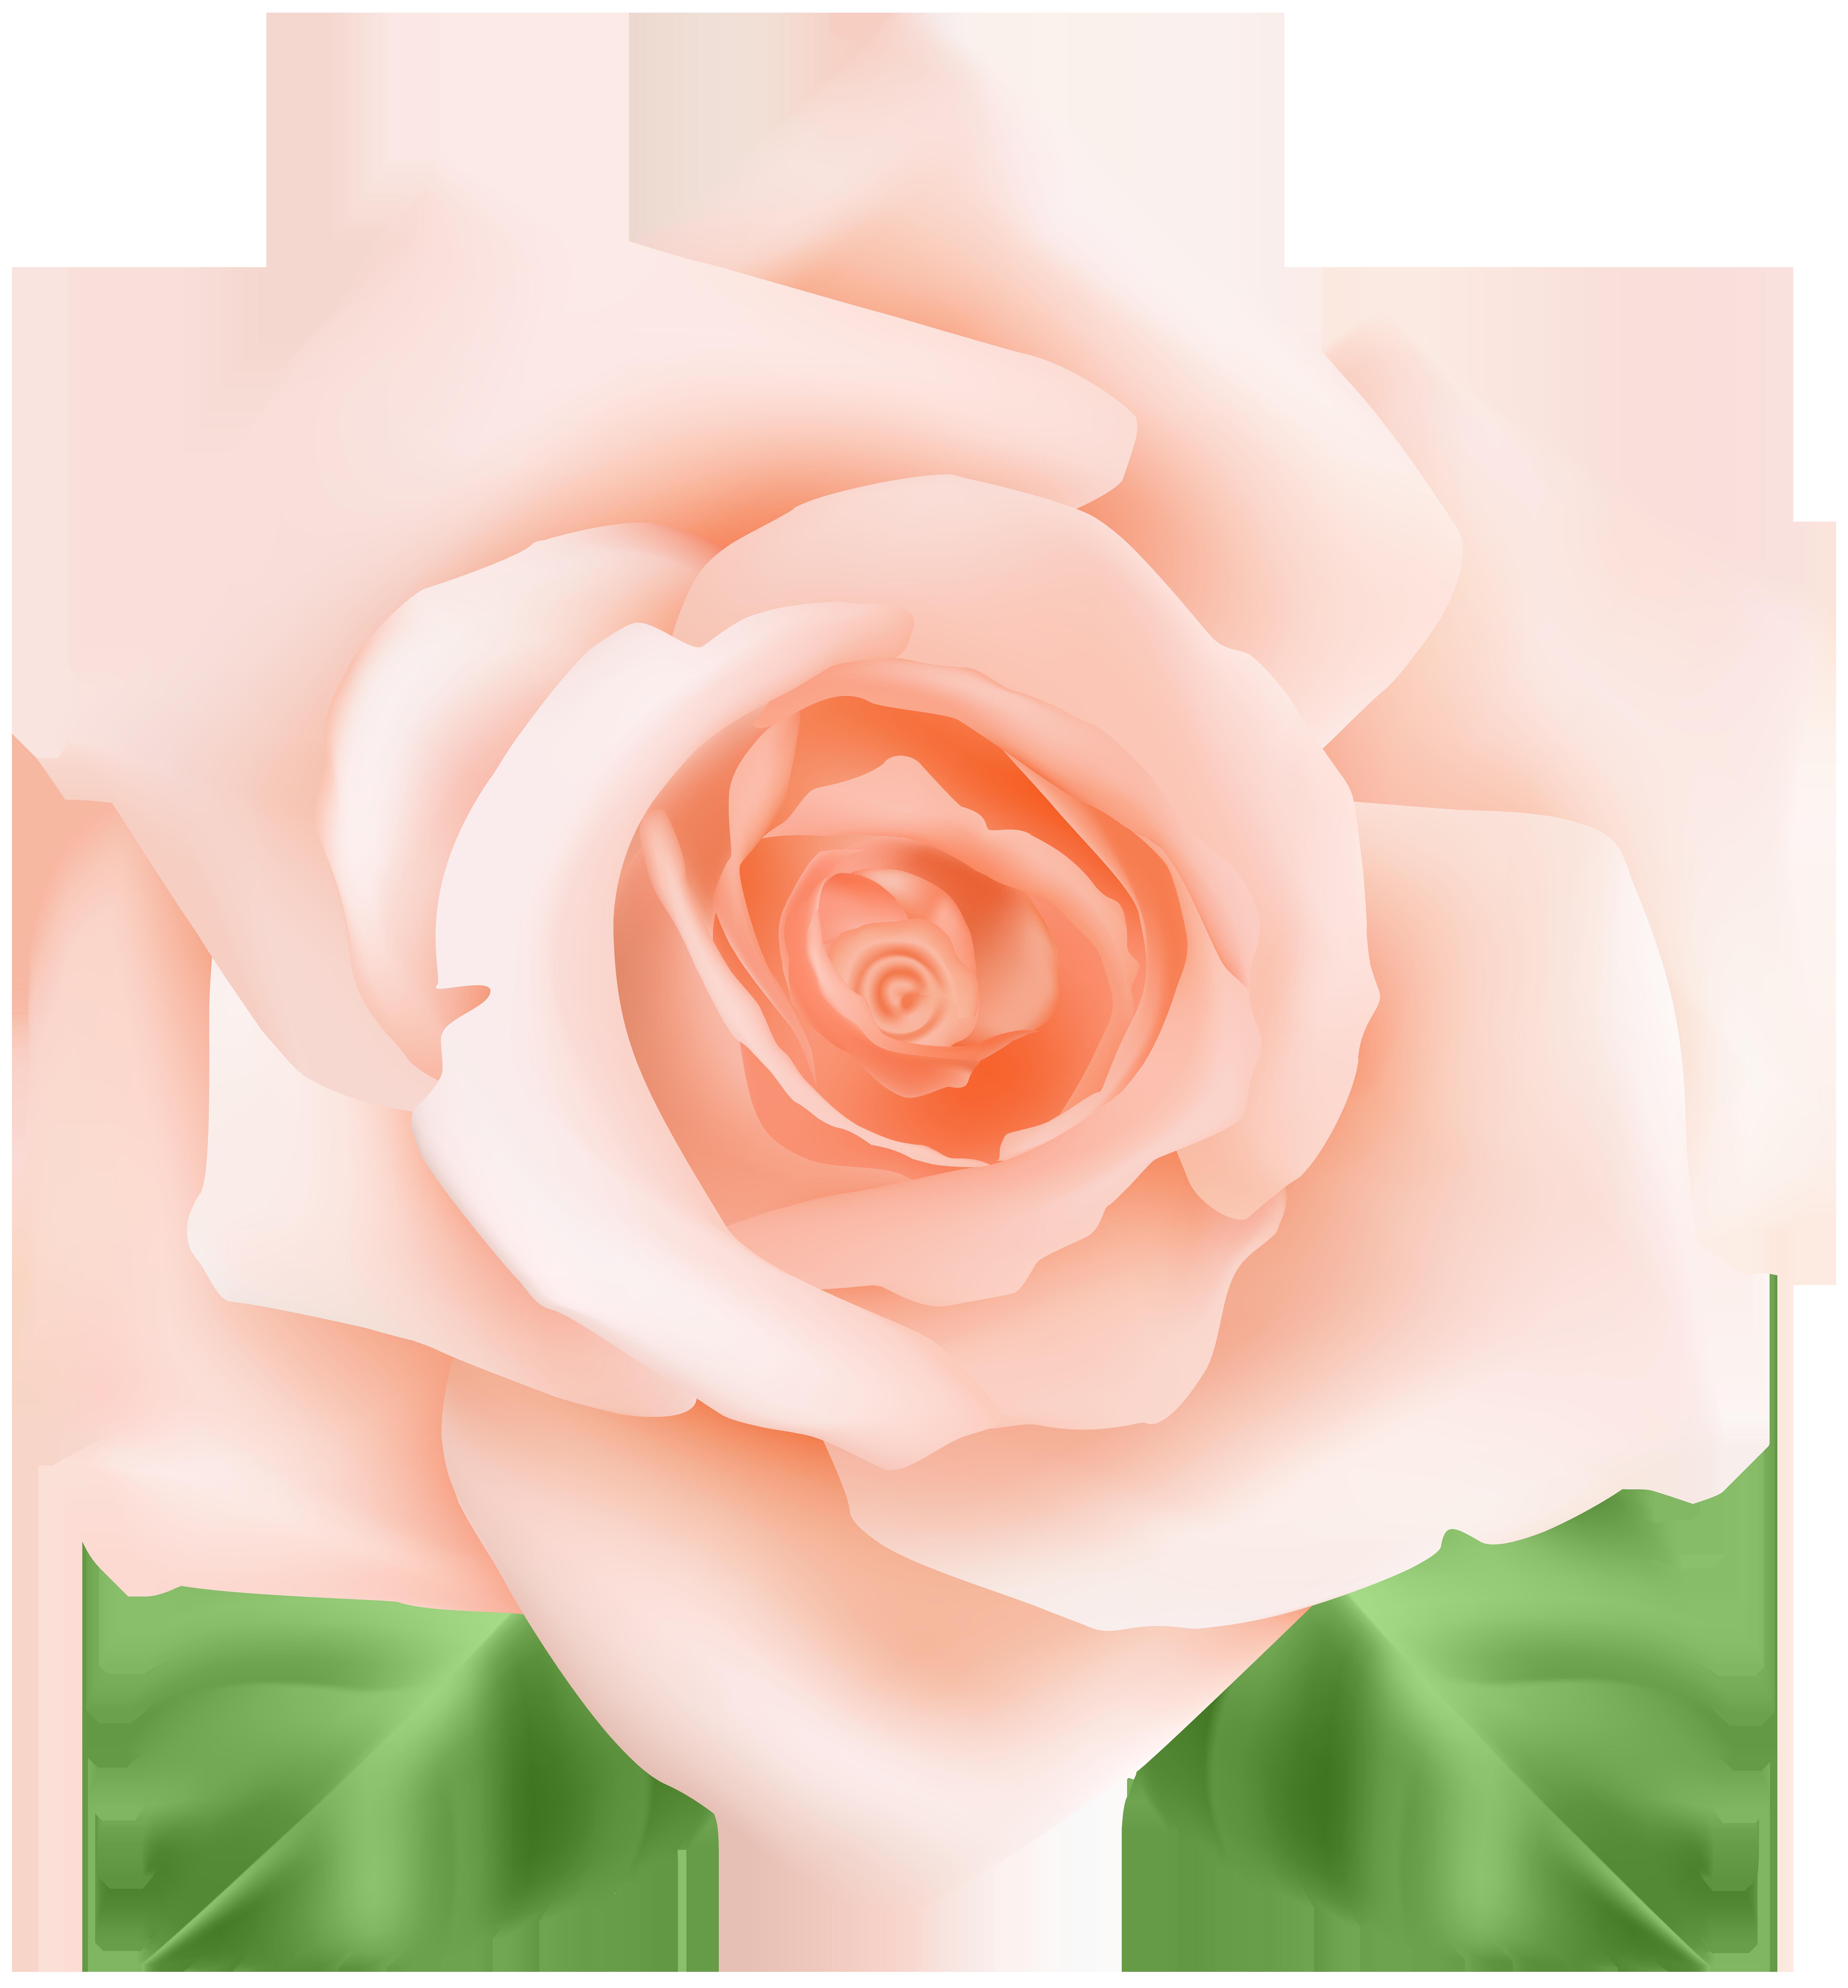 Png clip art image. Clipart rose peach rose